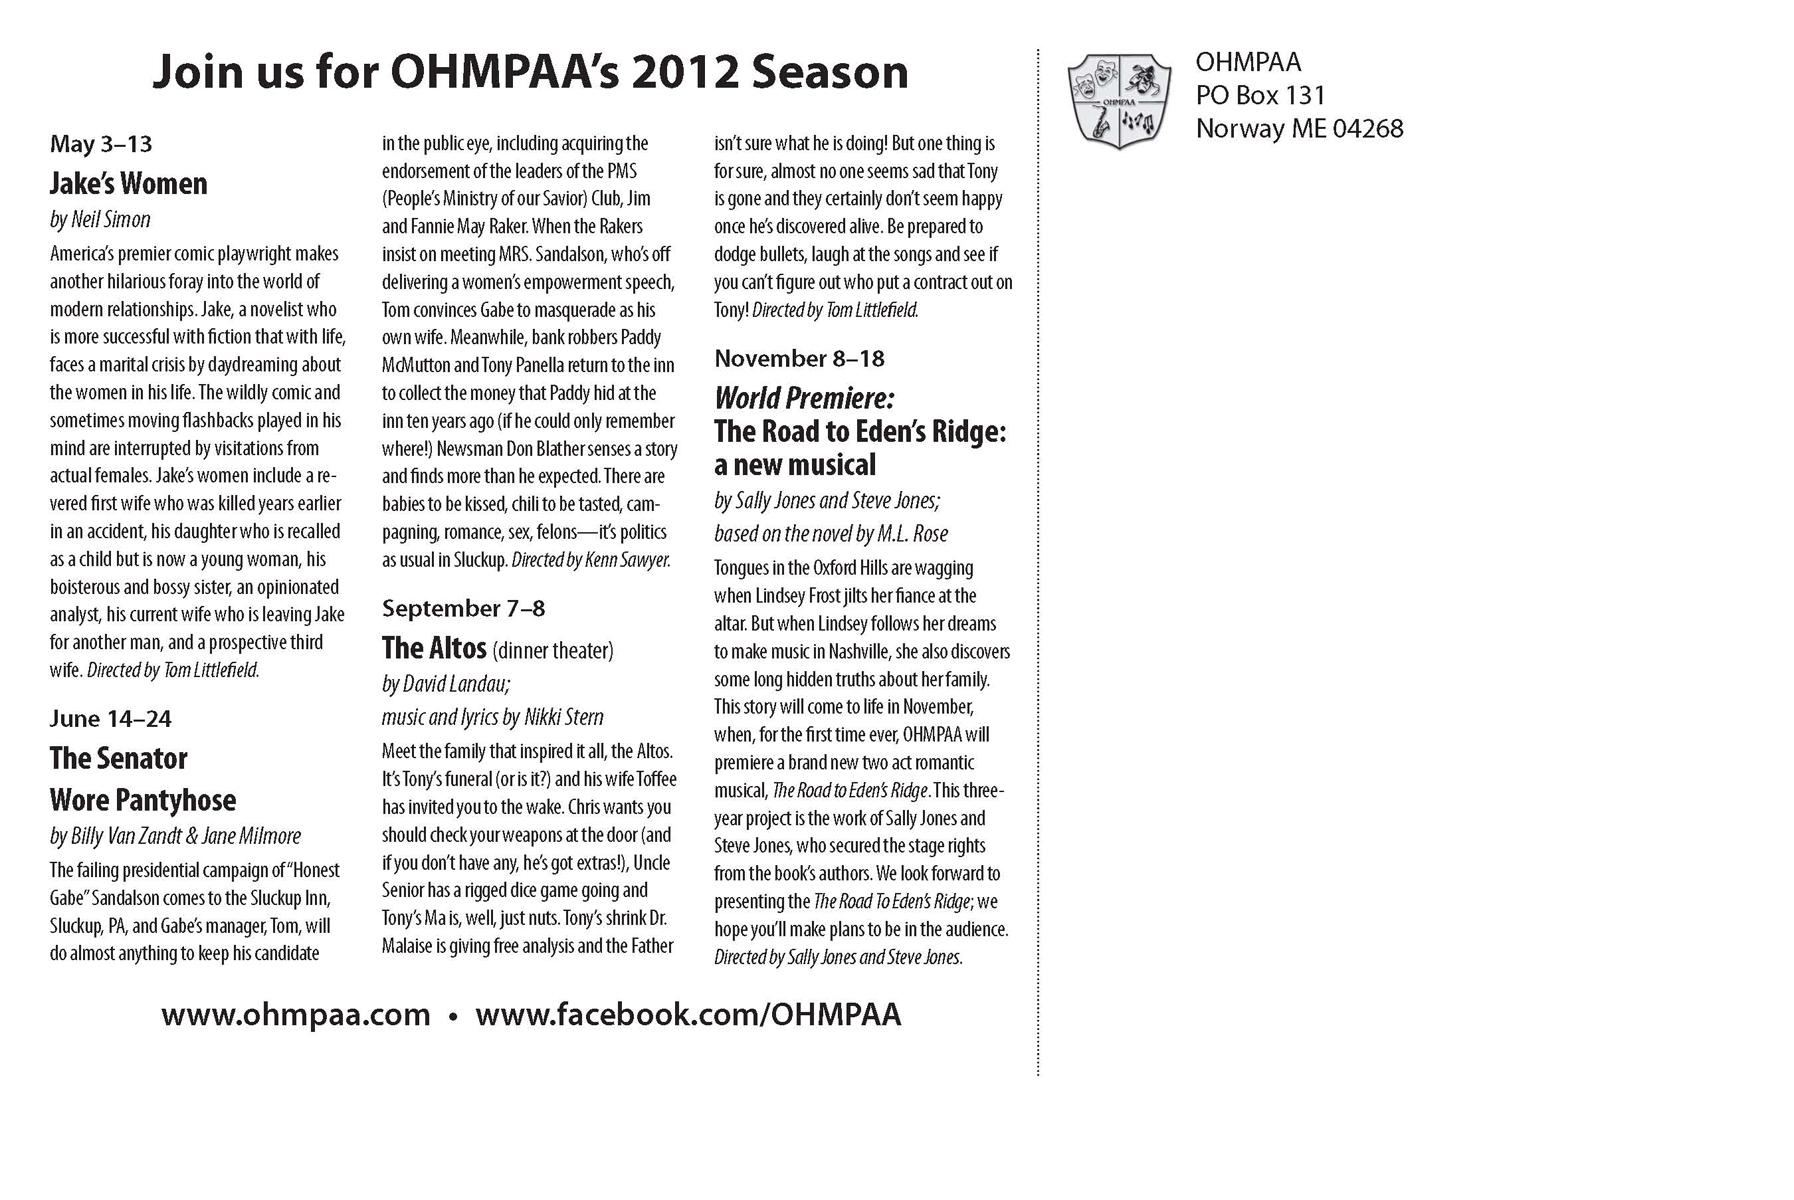 OHMPAA 2012 Postcard 2